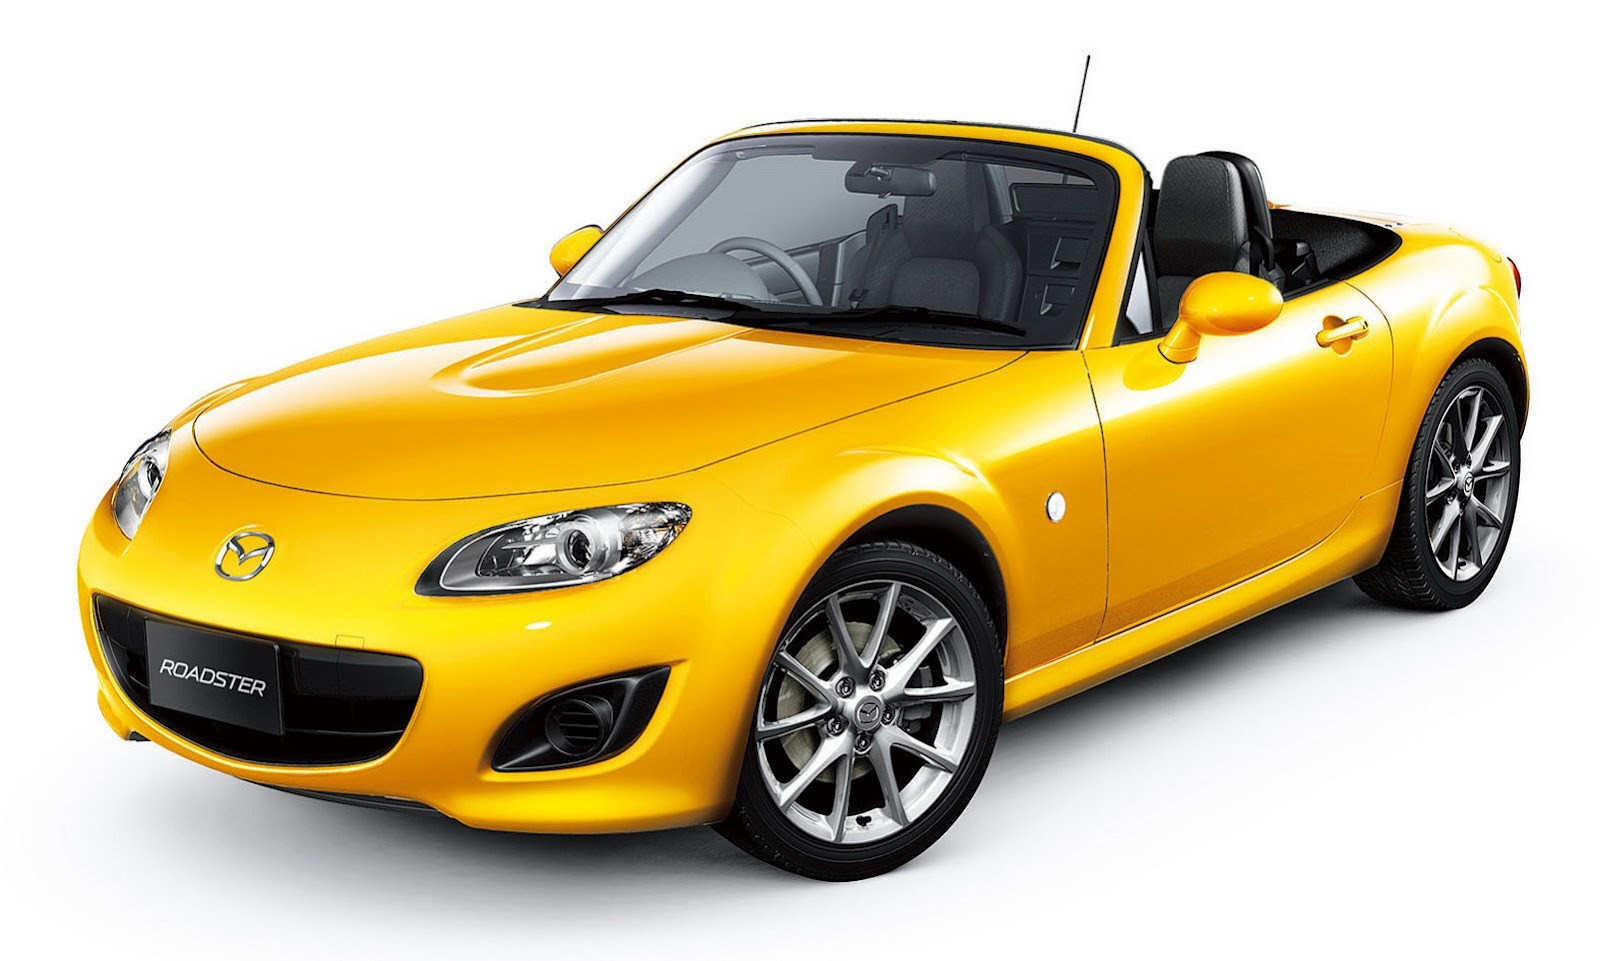 2015 Mazda Miata 2015 mazda mx-5 muscles car